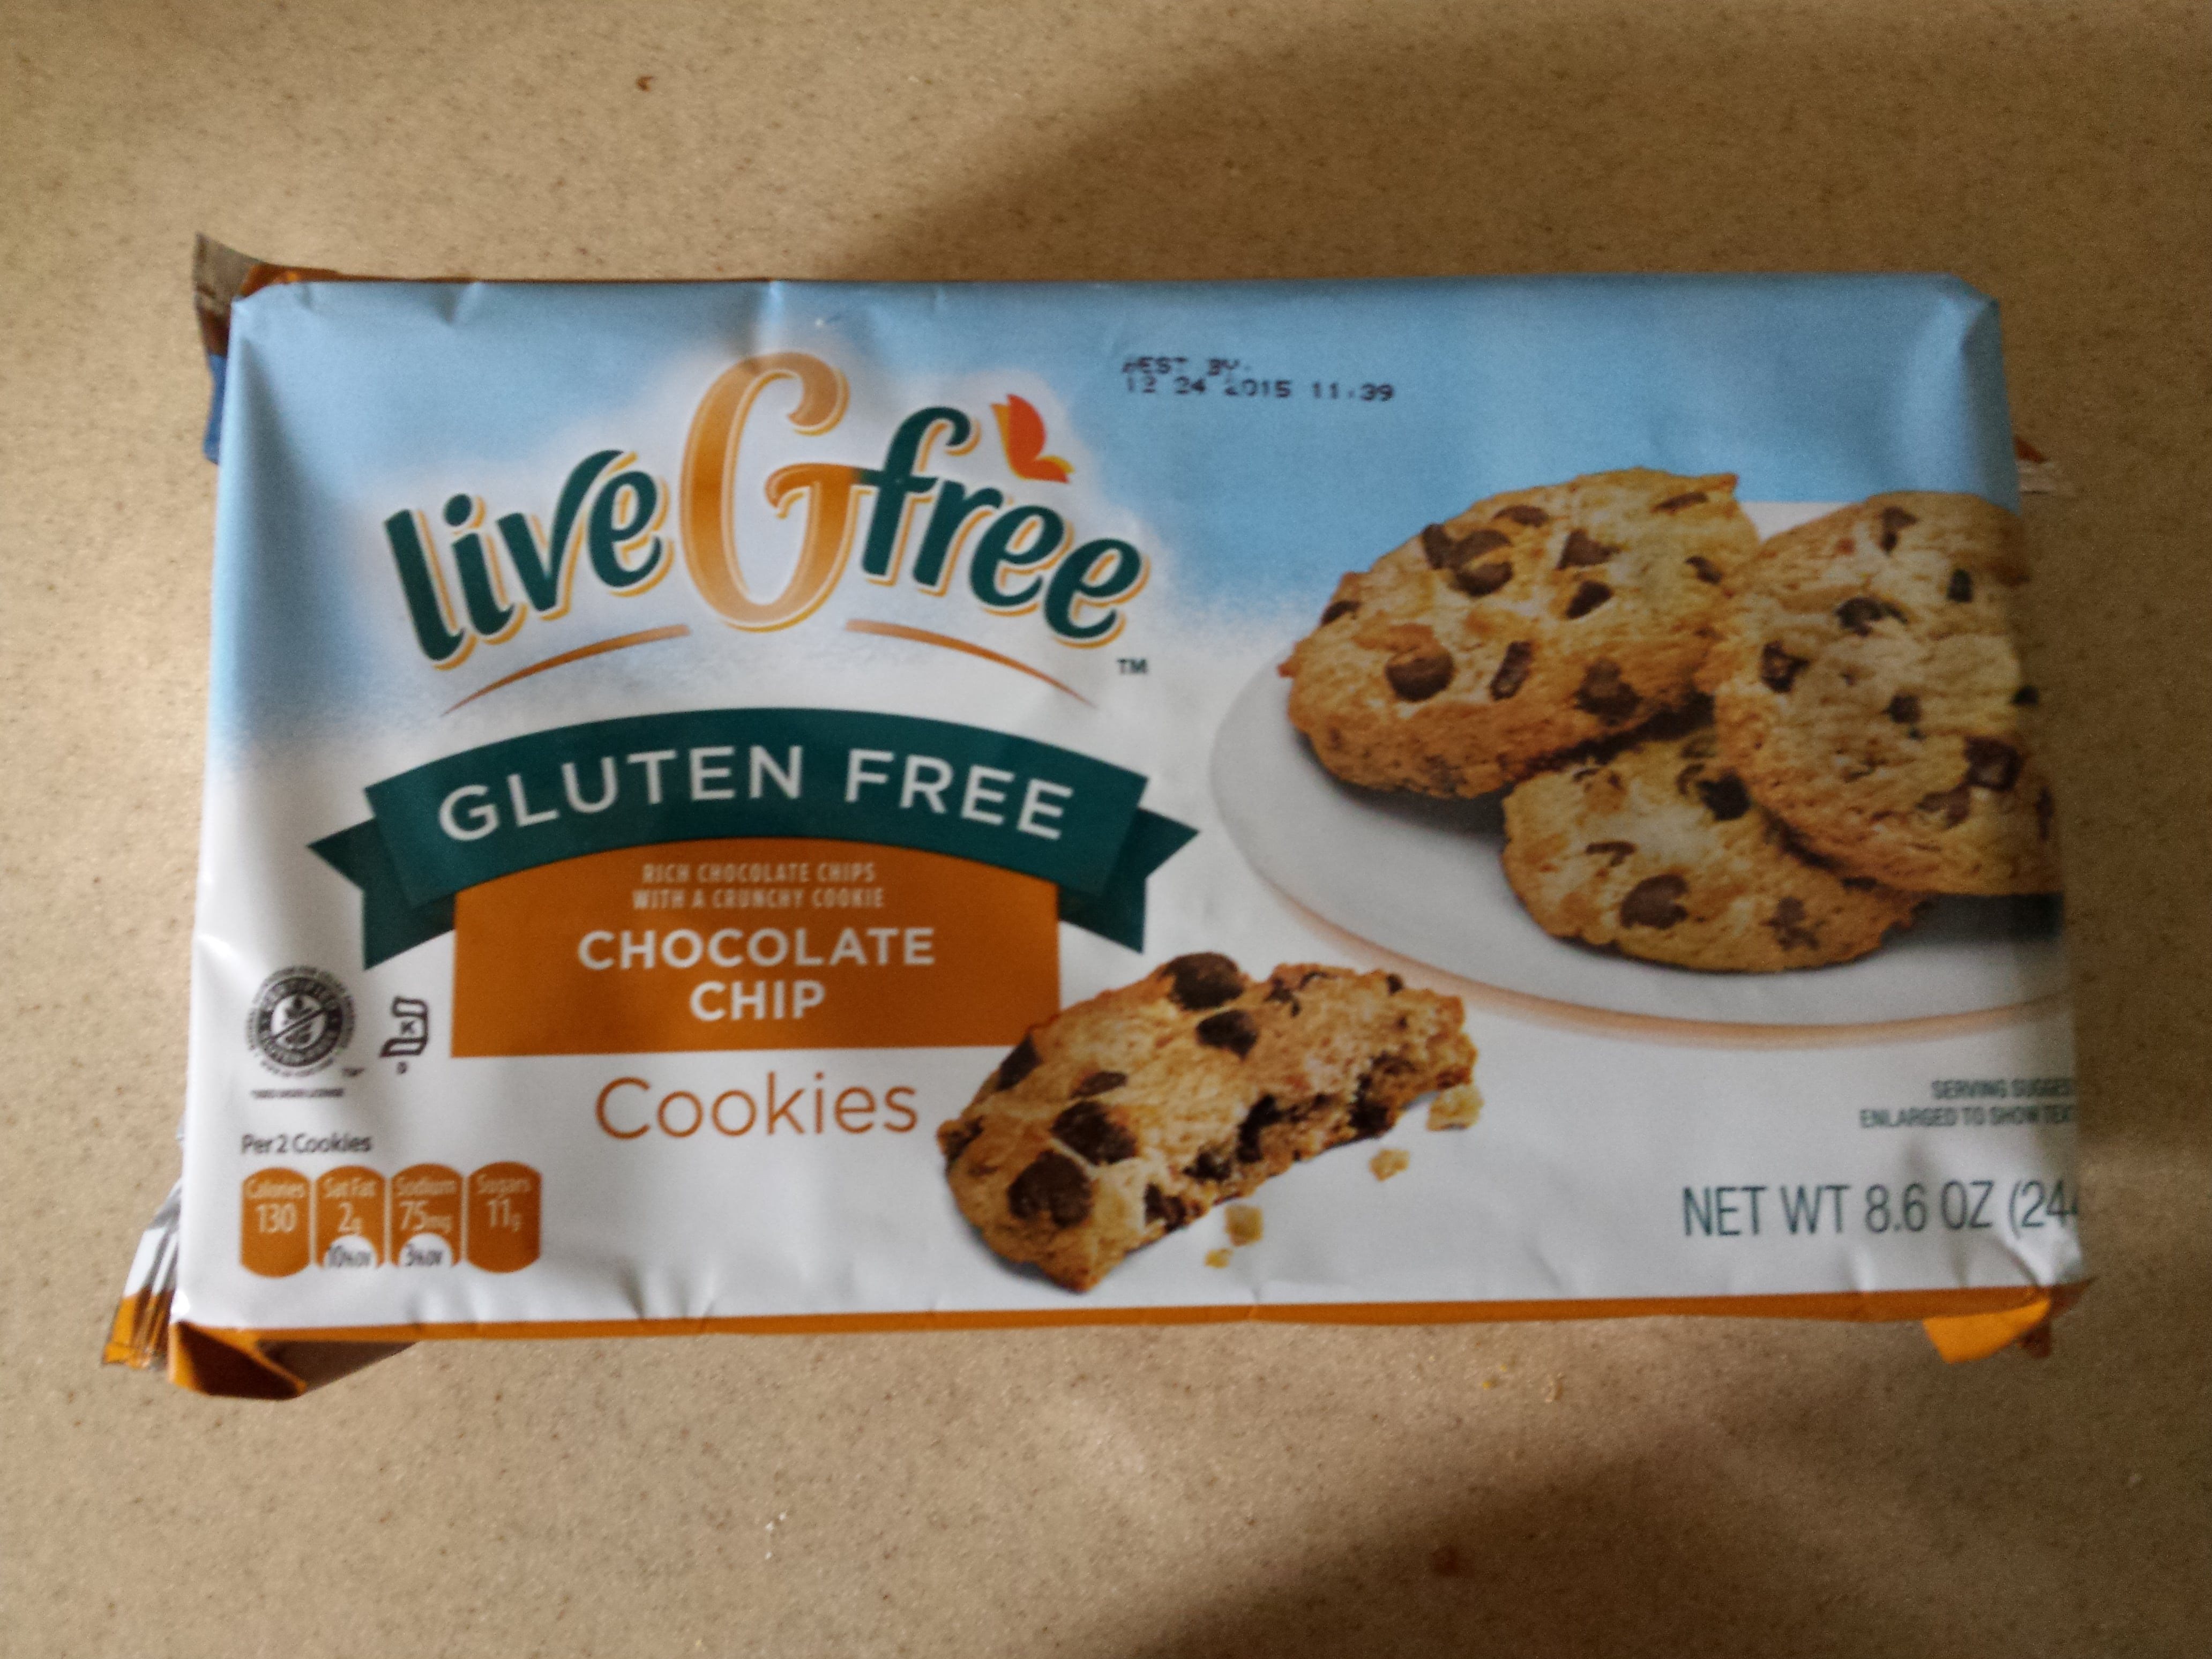 Aldi's Live G-Free Chocolate Chip Cookies - My Gluten Free Miami